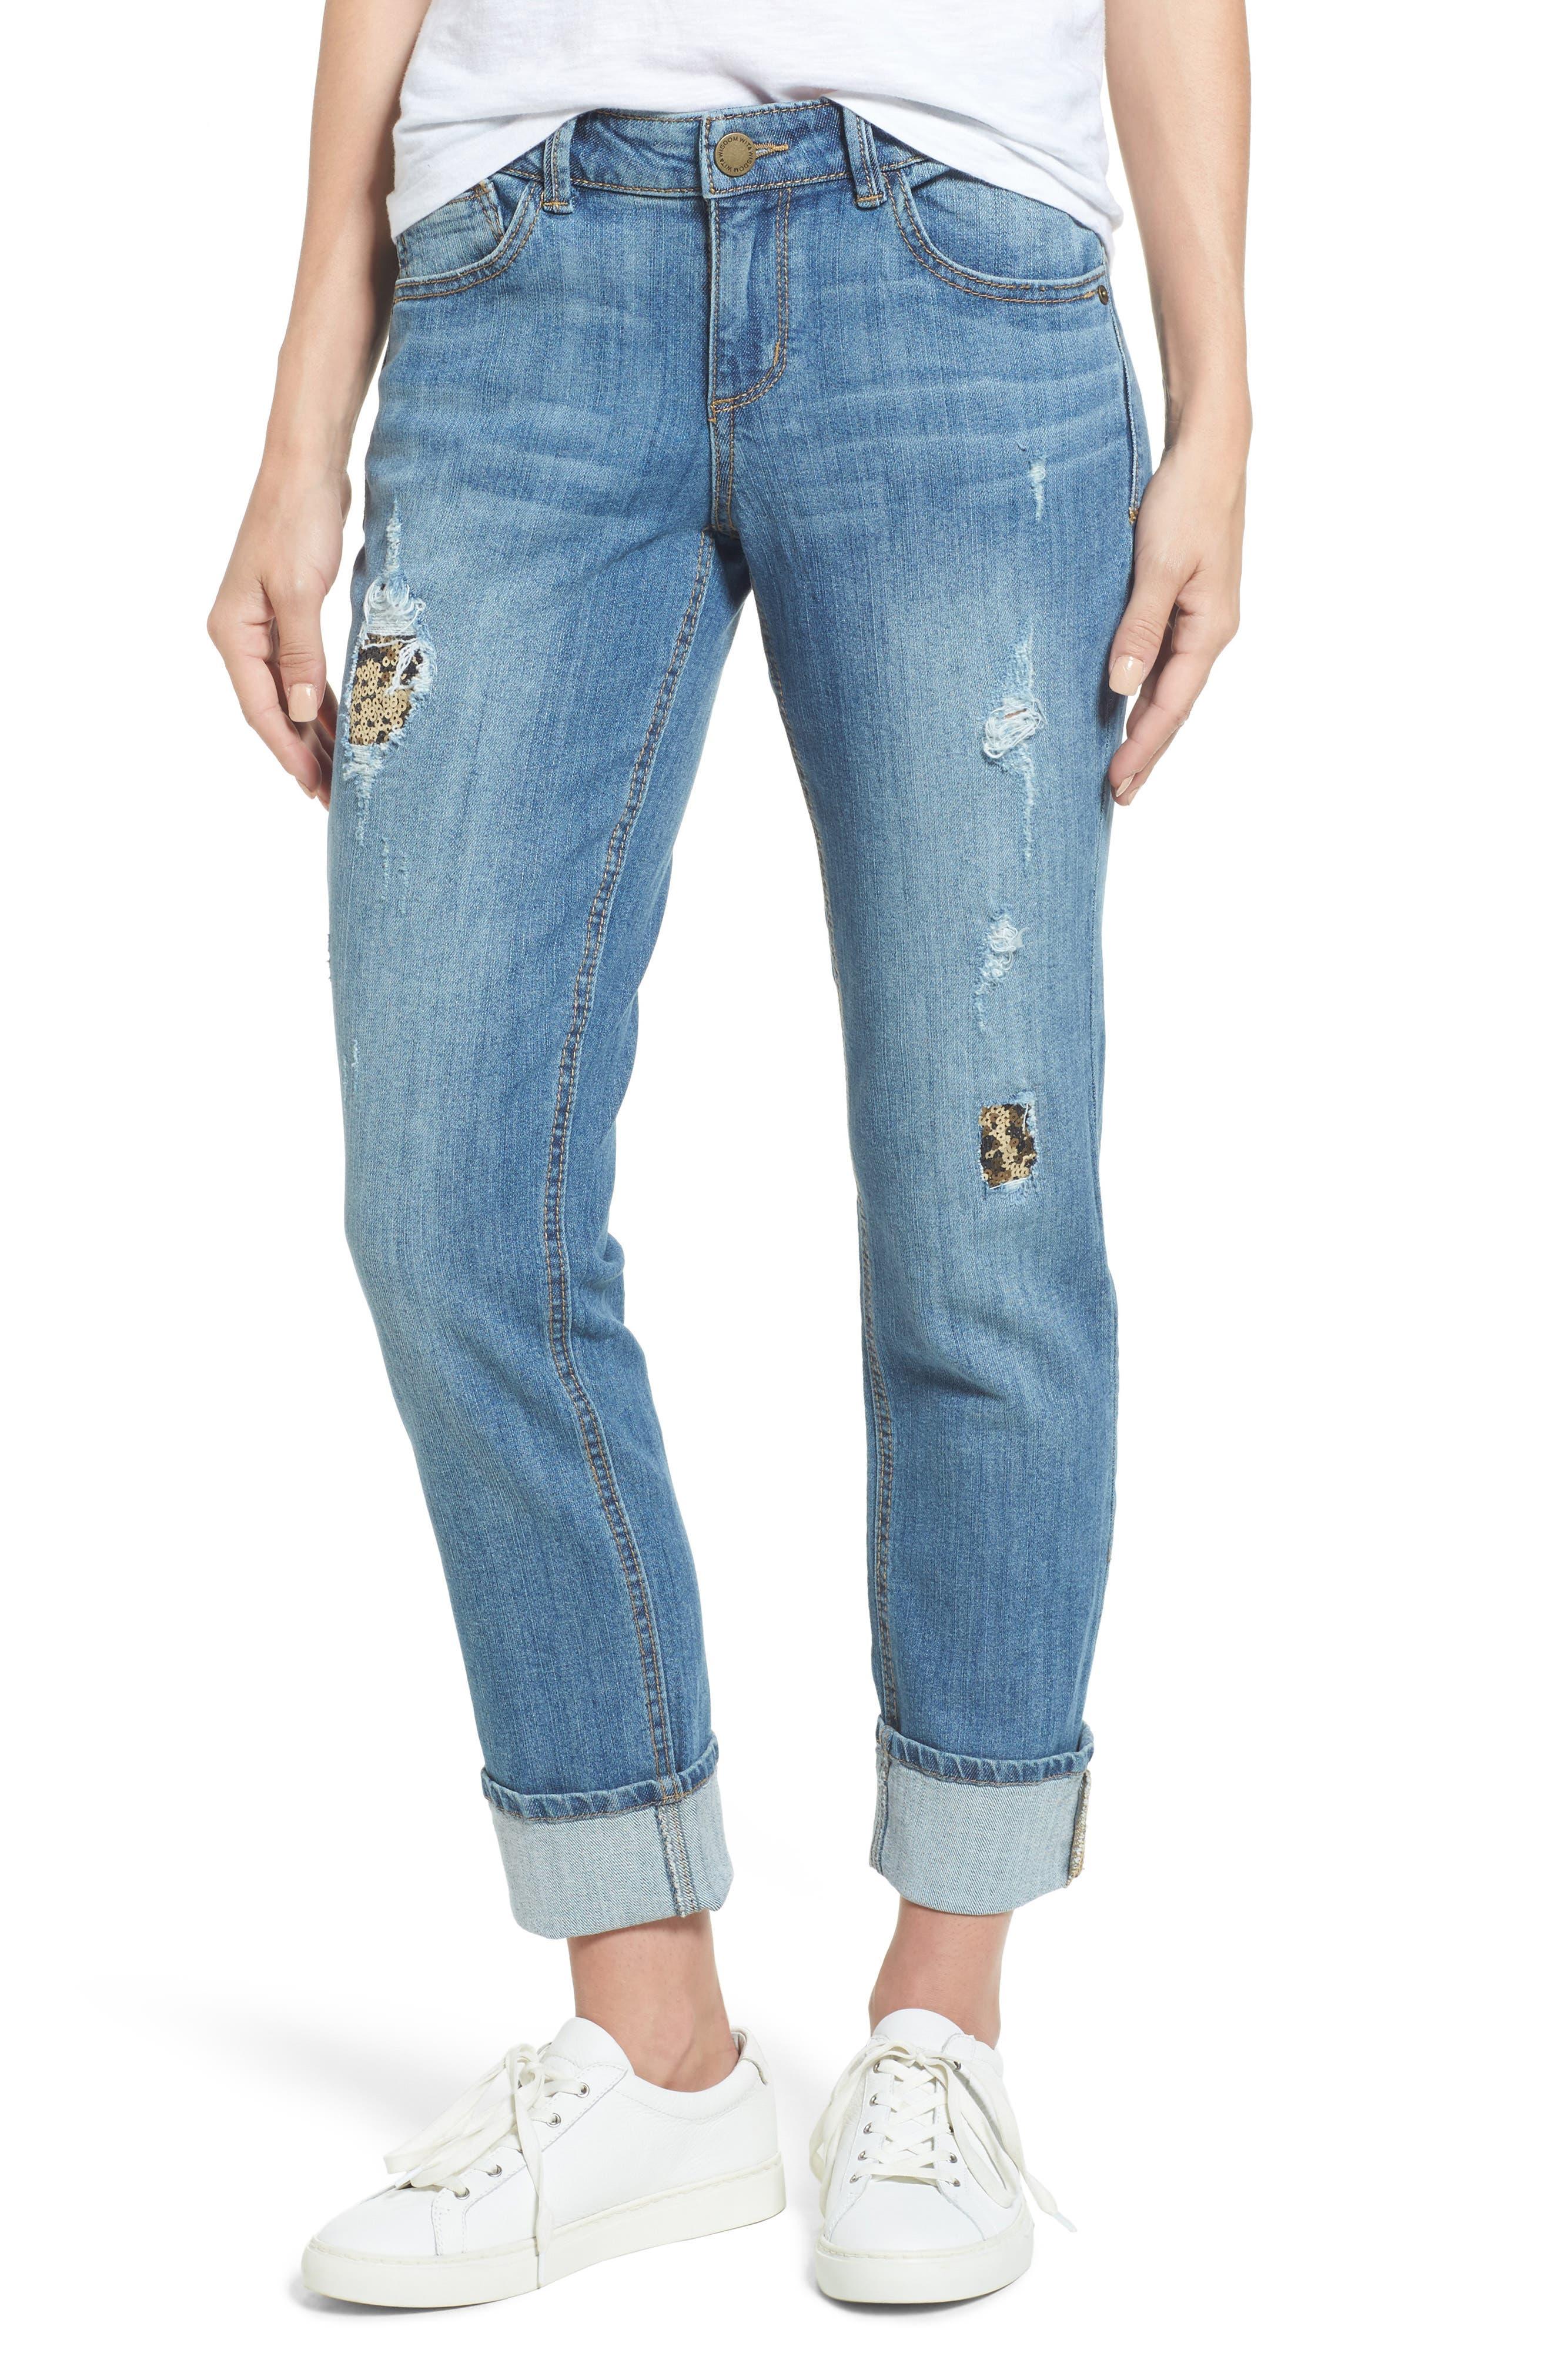 Alternate Image 1 Selected - Wit & Wisdom Flexellent Skinny Girlfriend Jeans (Nordstrom Exclusive)